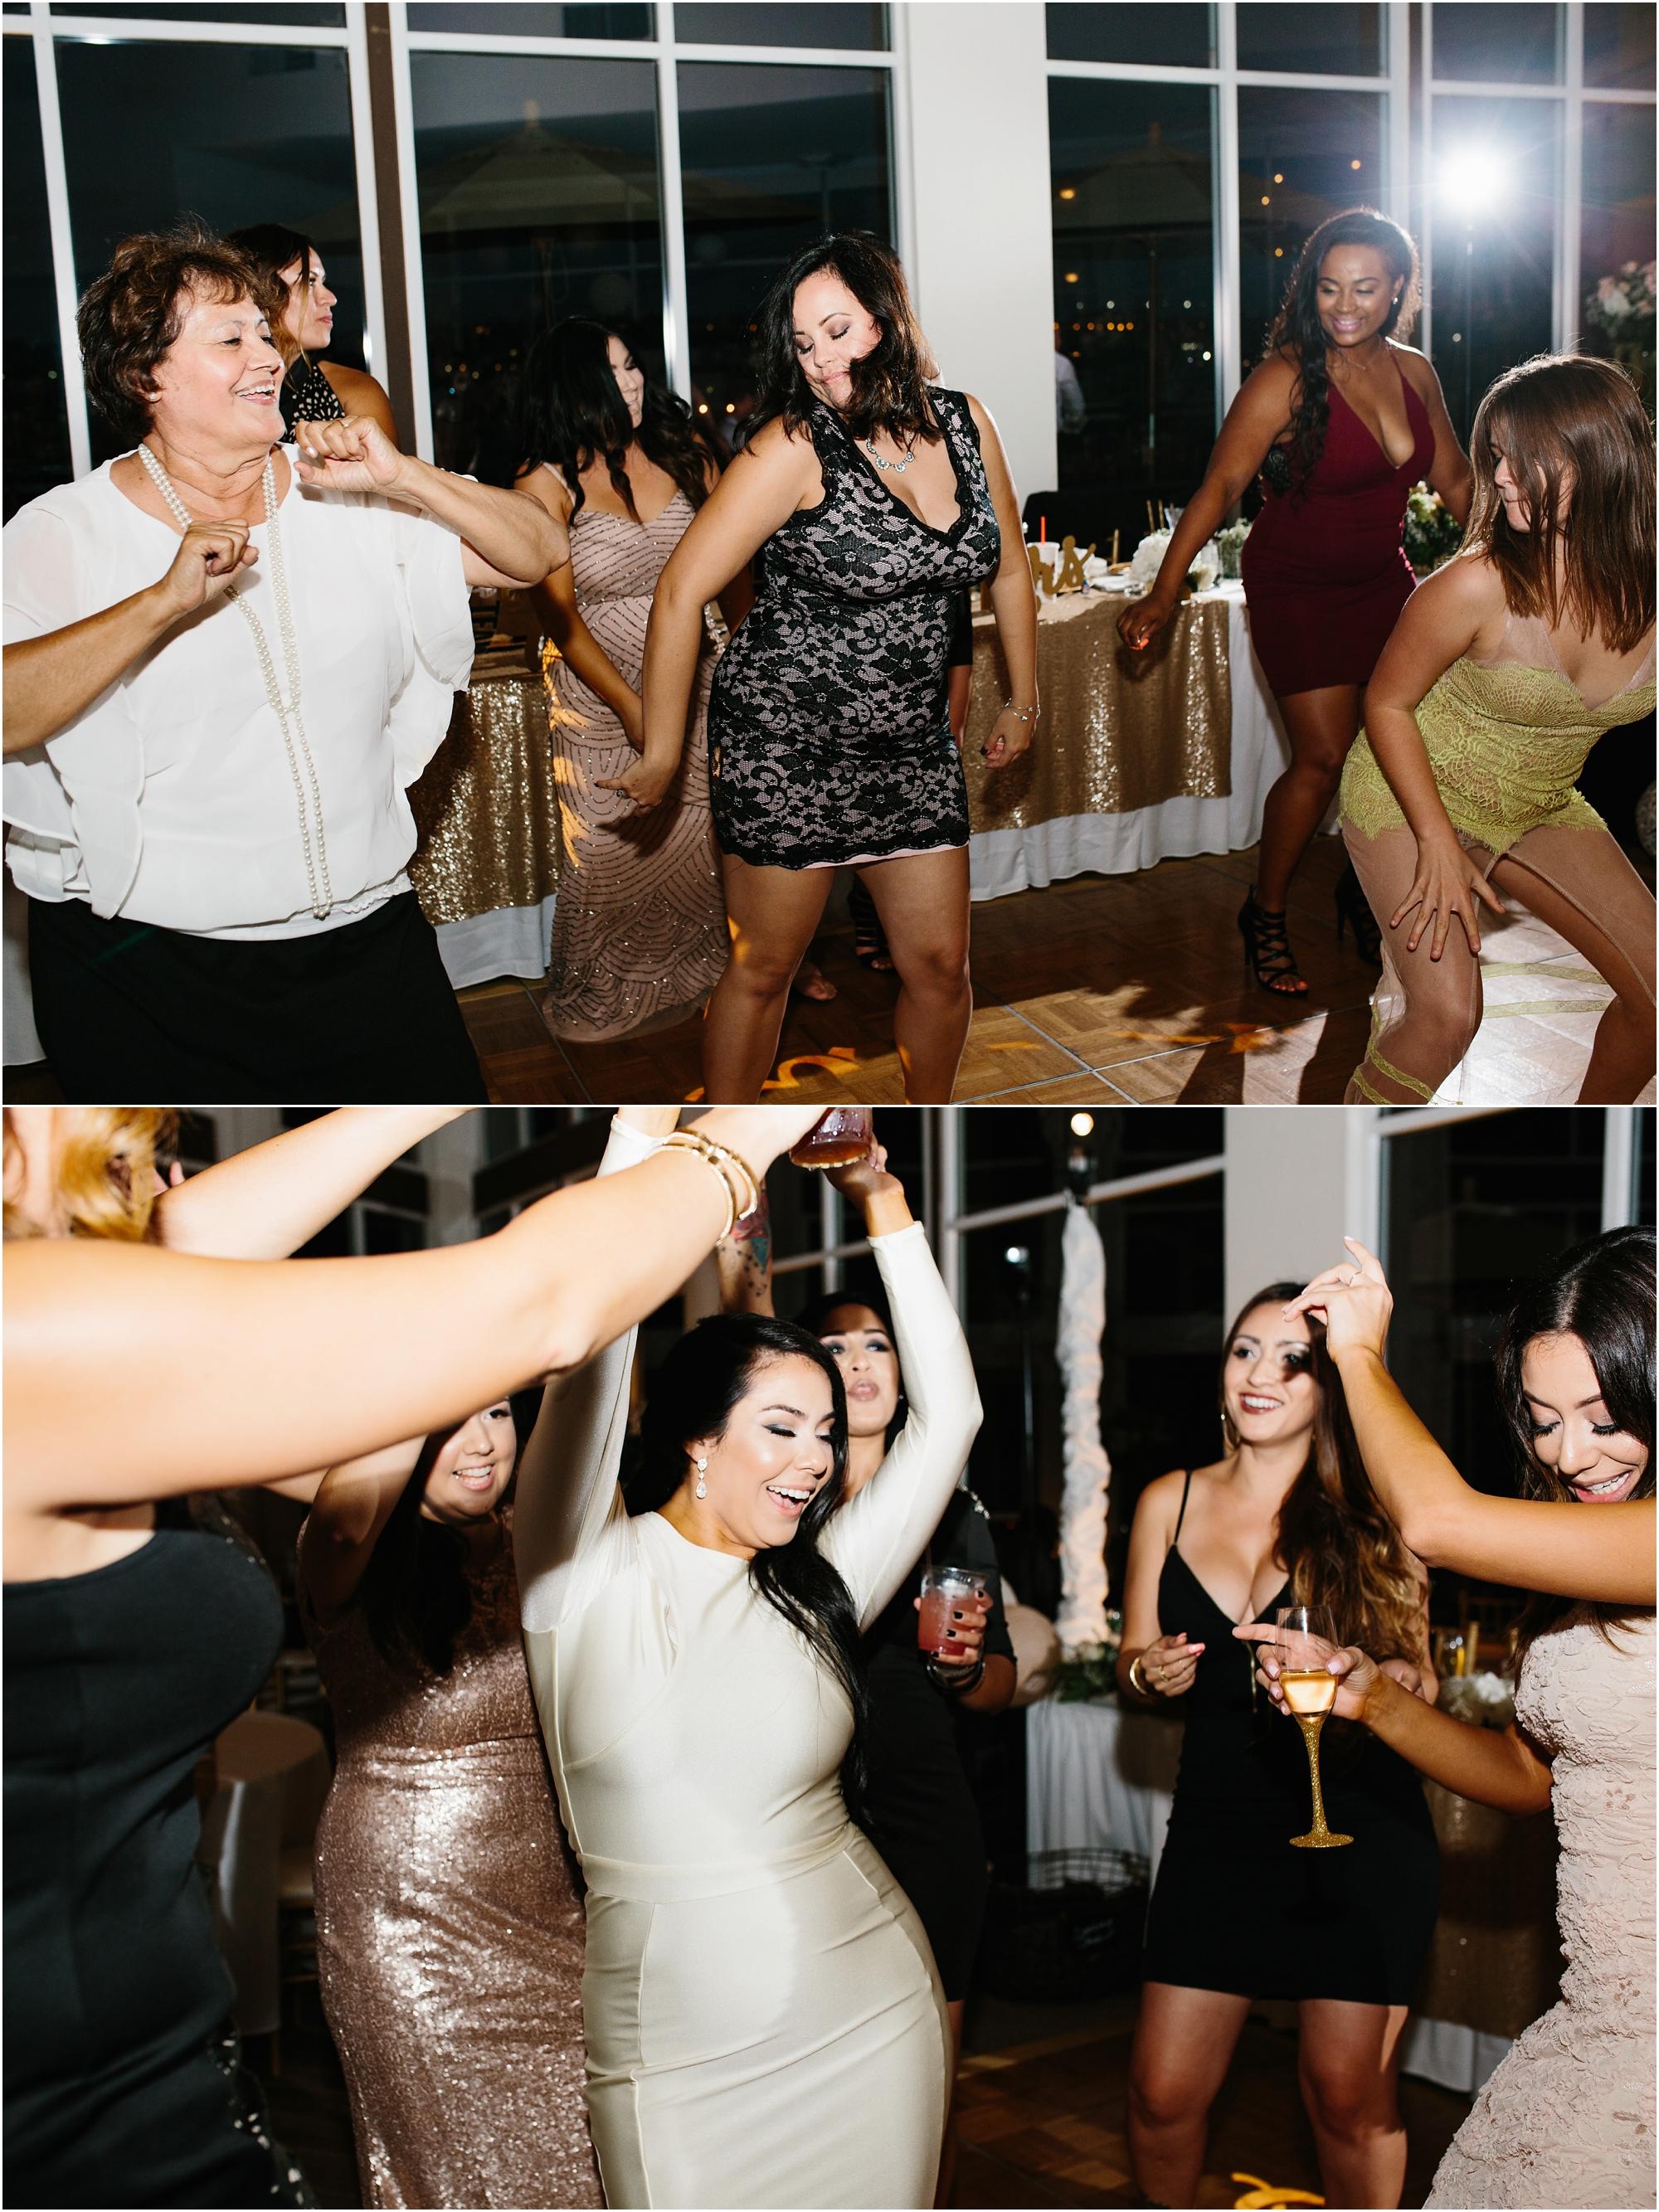 San Diego Wedding Reception - http://brittneyhannonphotography.com